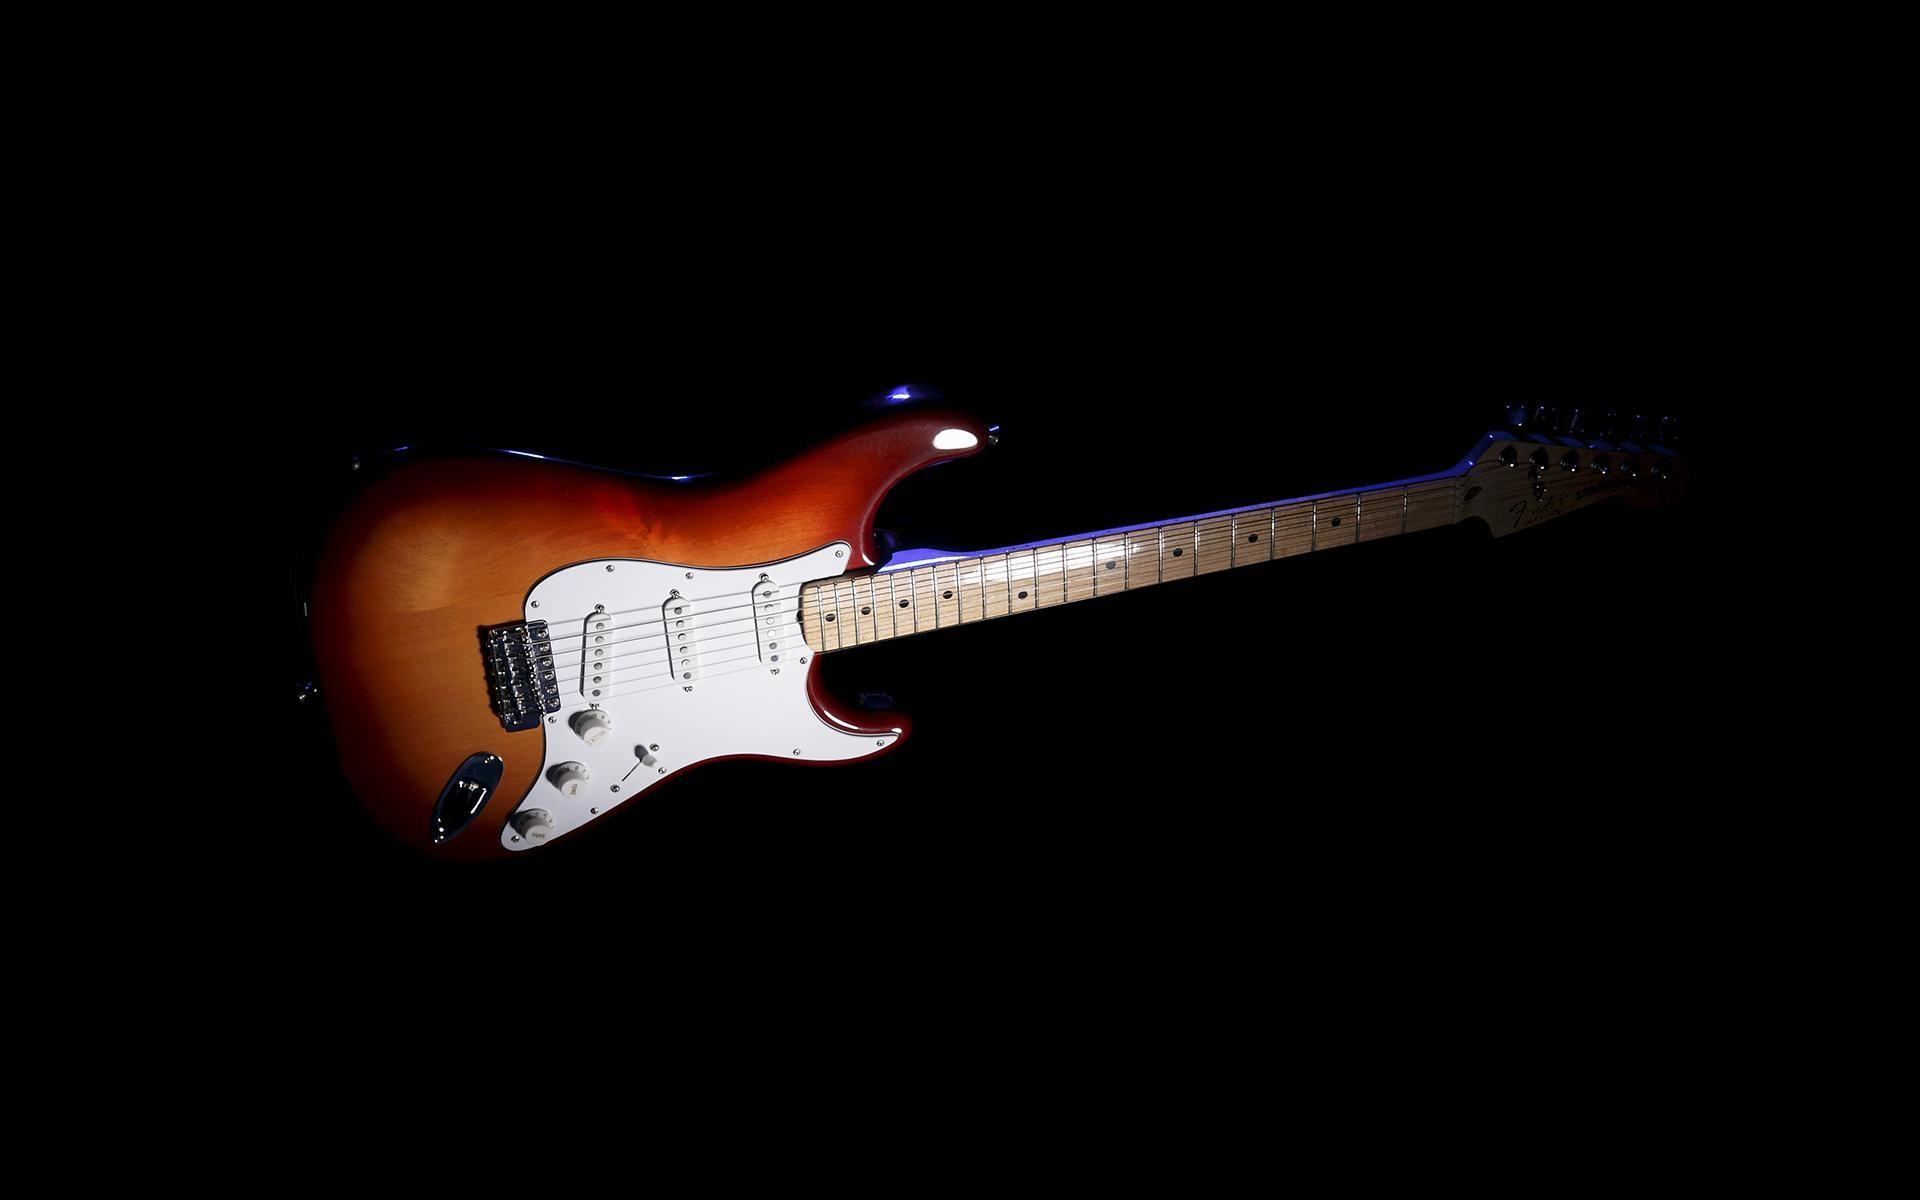 wallpaper.wiki-Fender-strat-wallpaper-hd-PIC-WPB002757